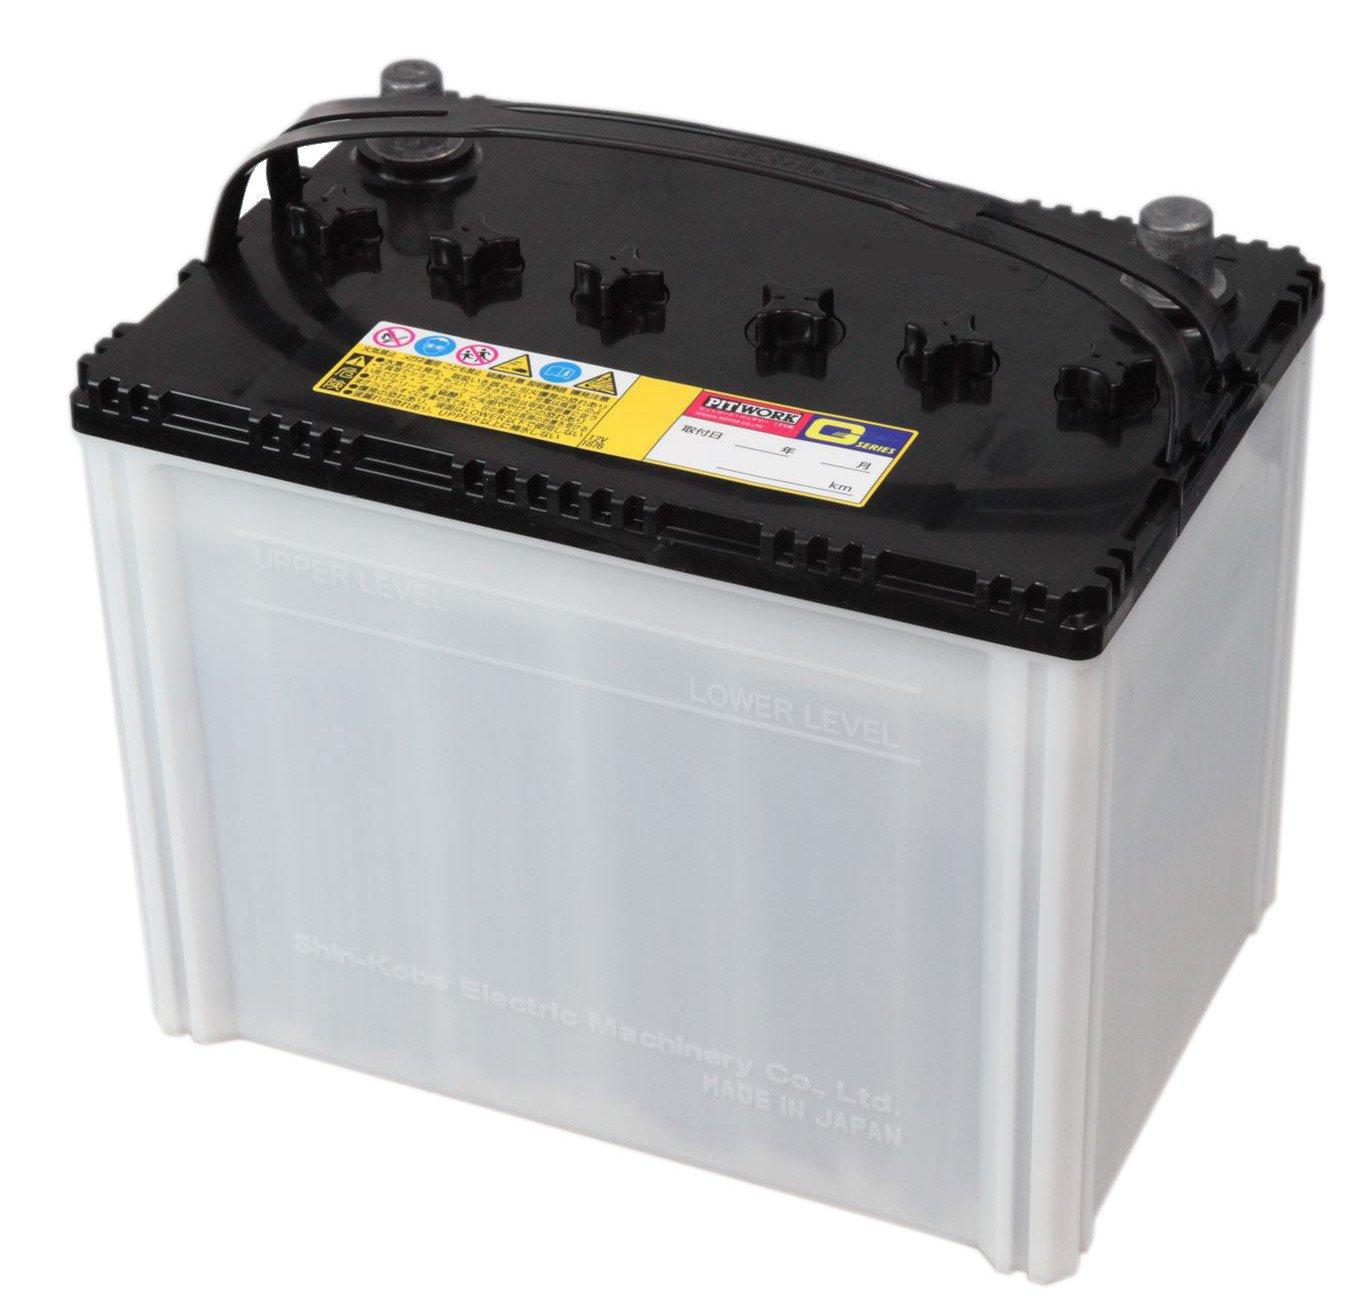 PITWORK (ピットワーク) 日産純正 国産車バッテリー (Gシリーズ) 85D26R B00JQWJMU2